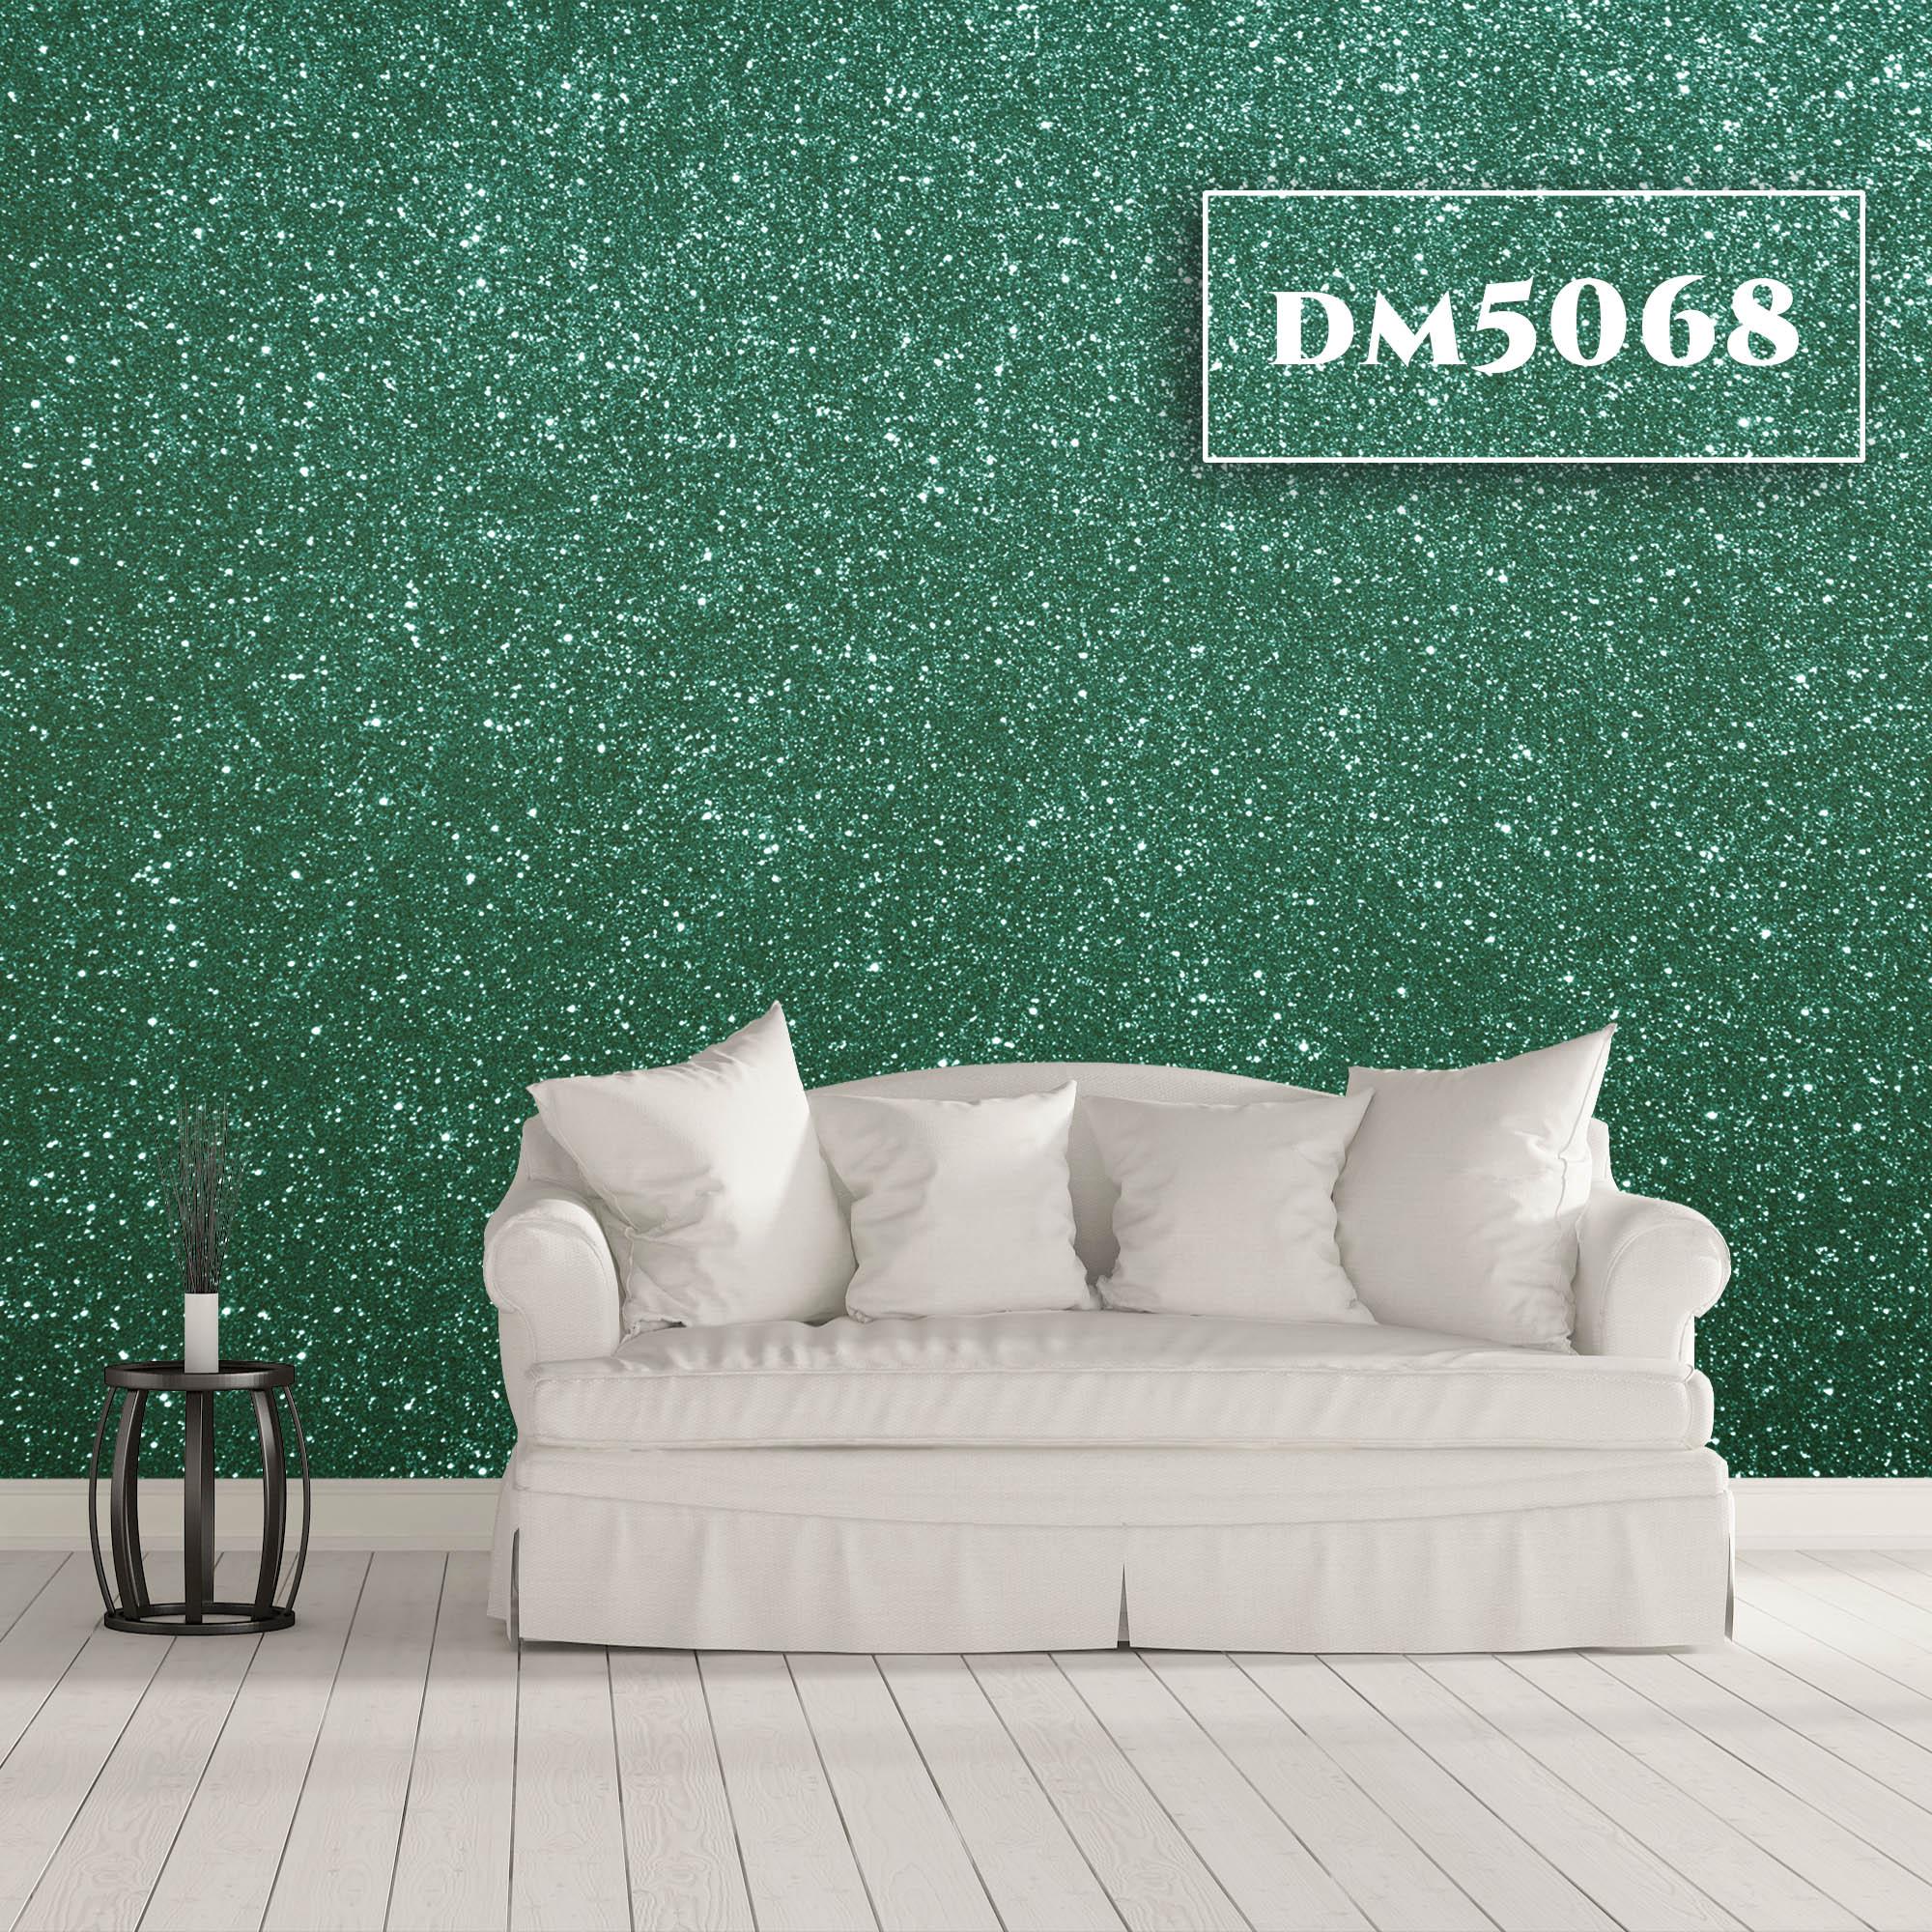 DM5068